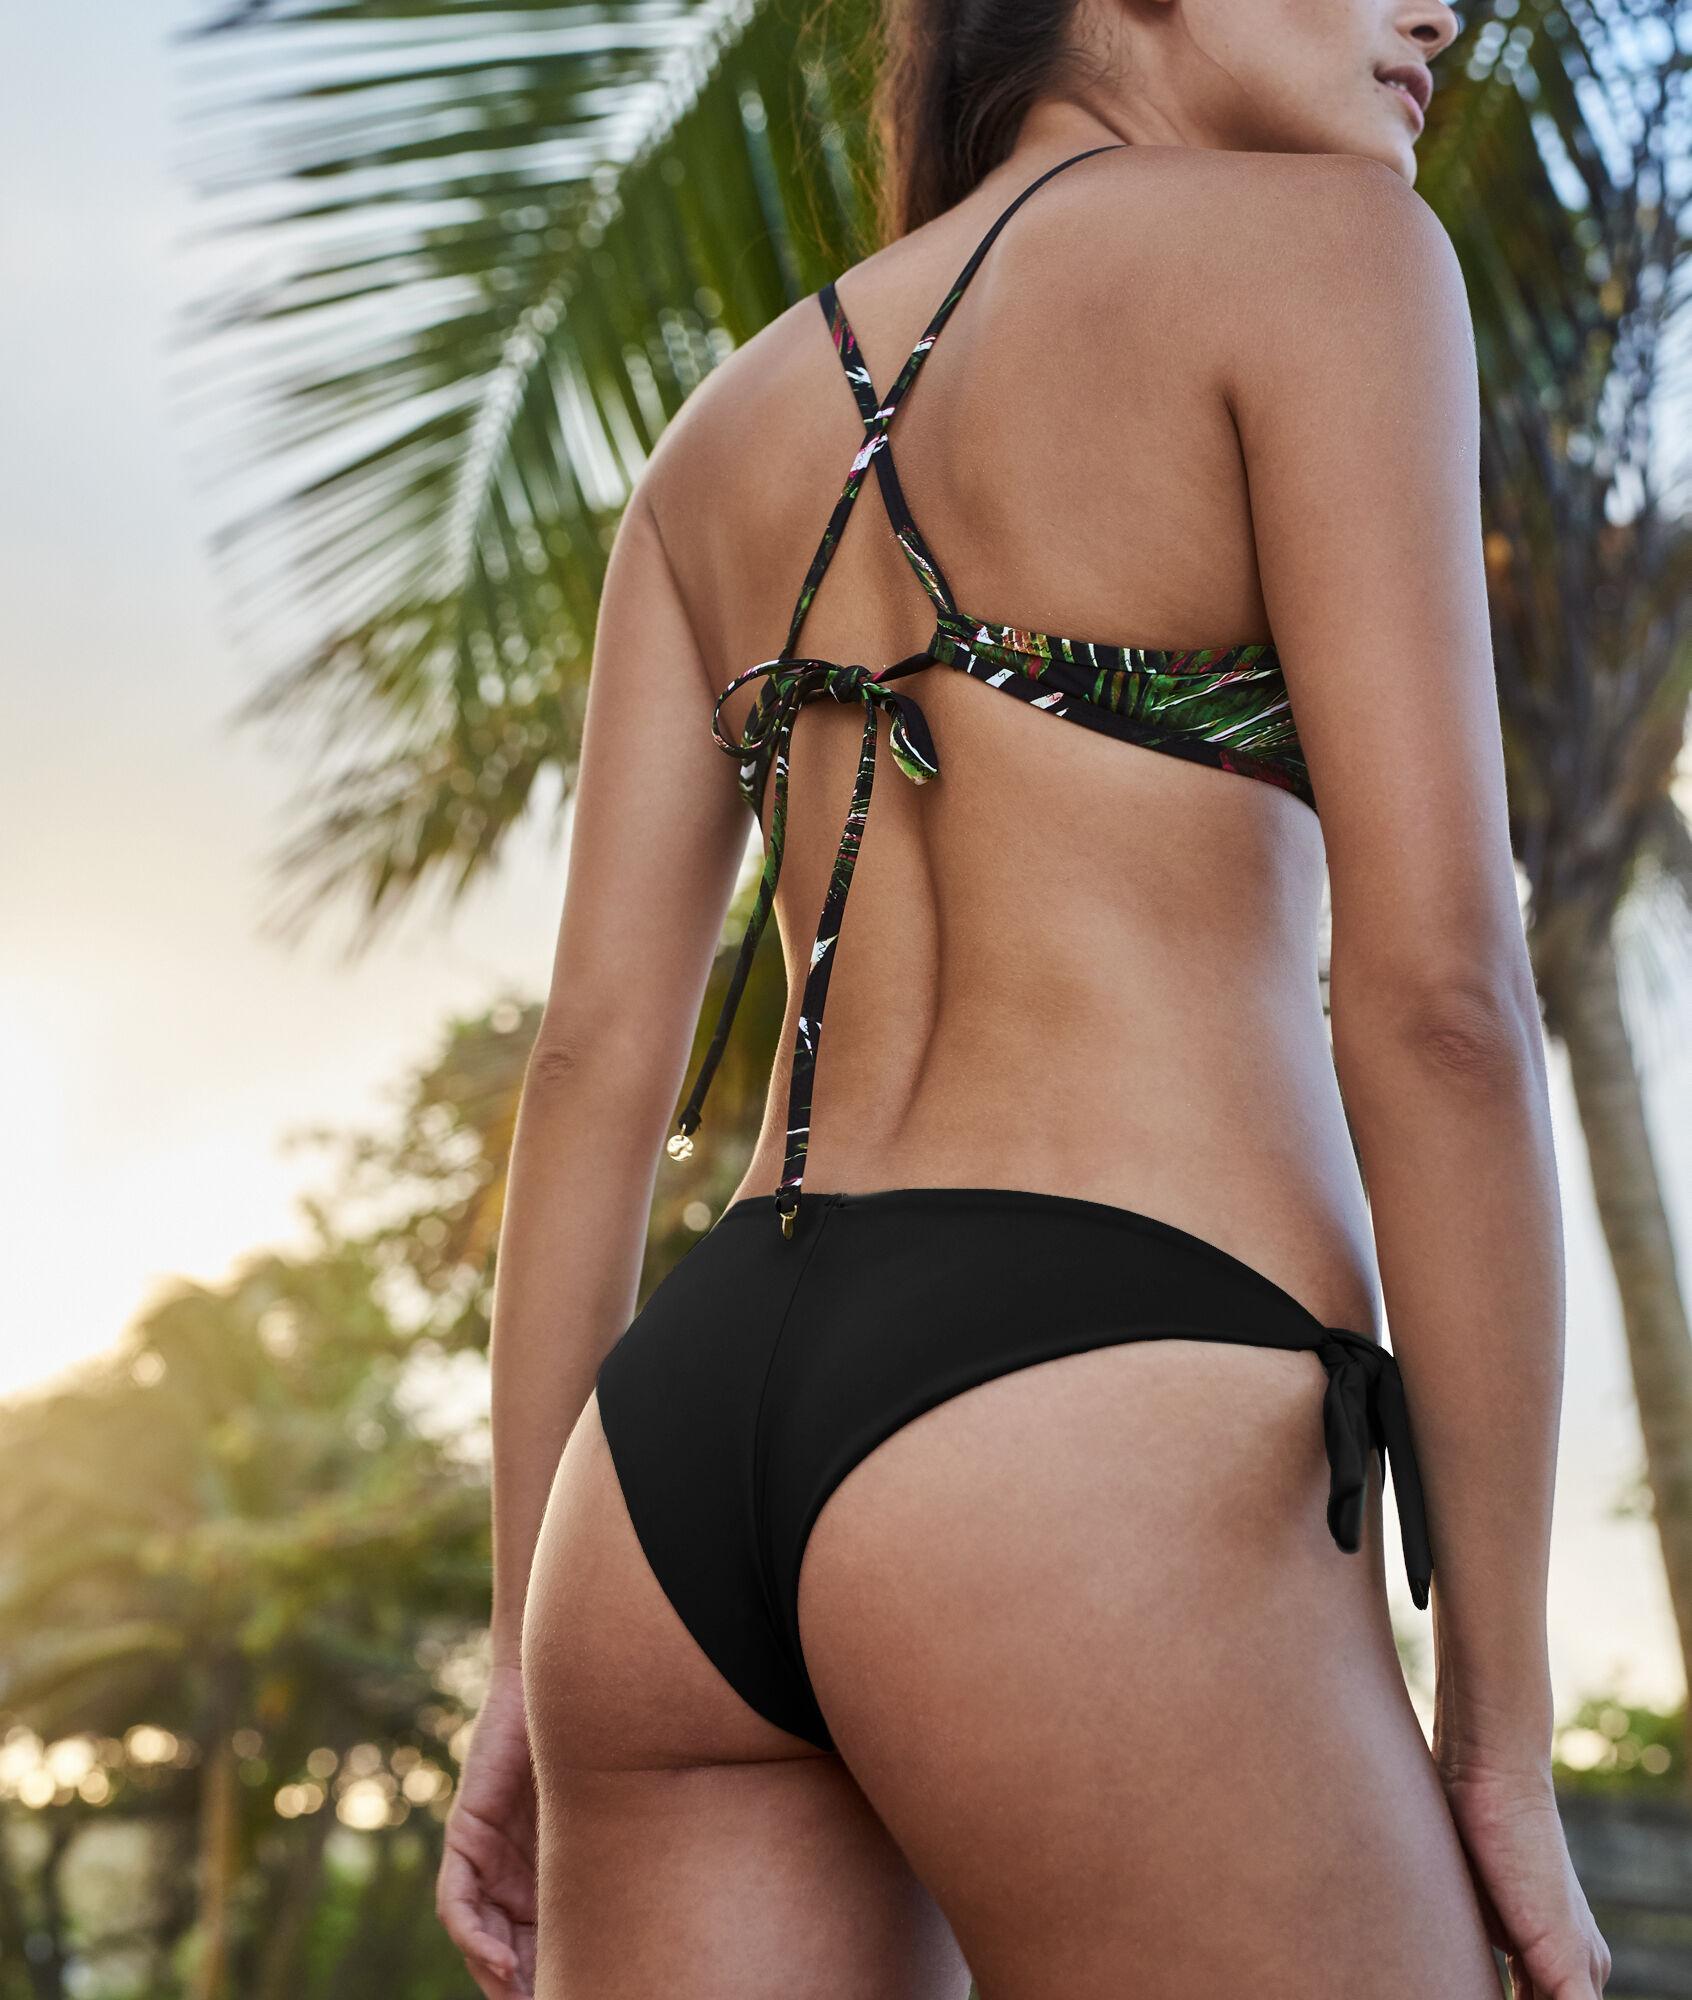 Bikini Braguita Bikini Brasileña Braguita Braguita Bikini Brasileña Brasileña Braguita qULVpGSzM